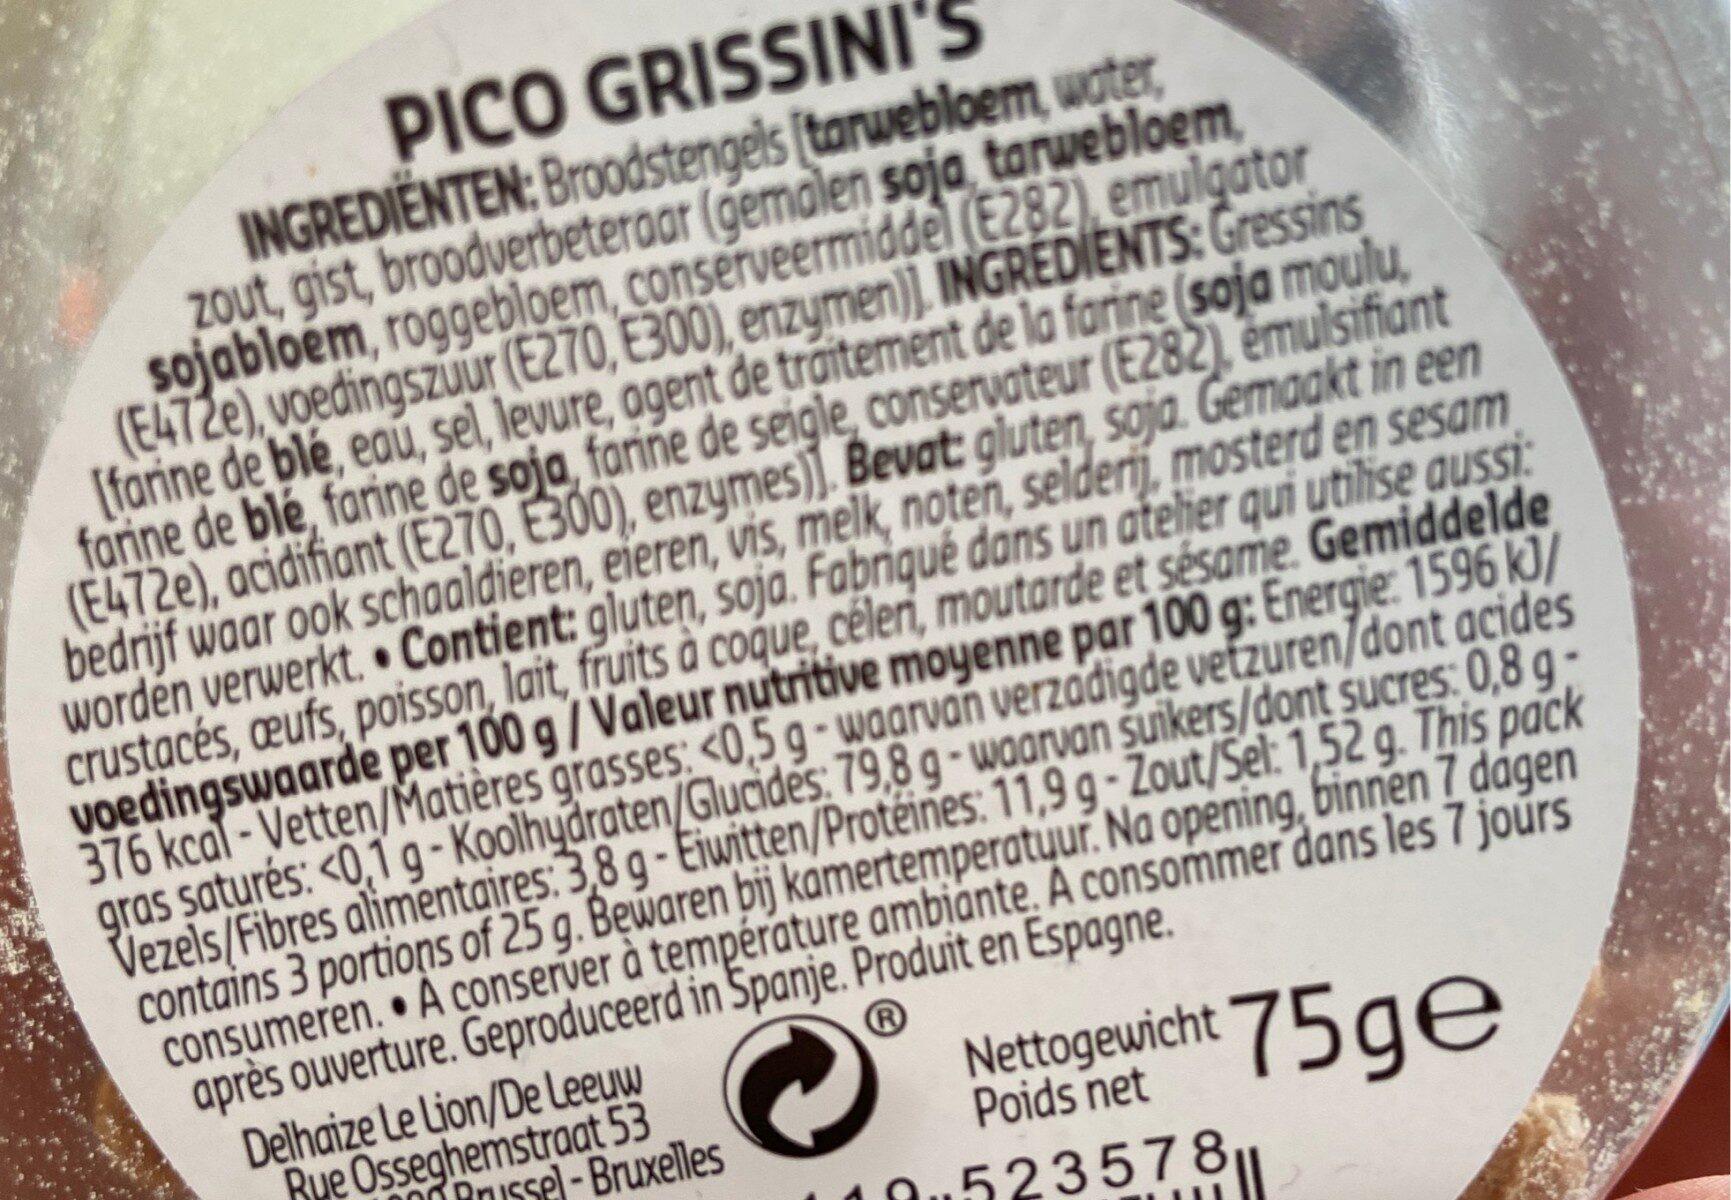 Pico grissini's - Voedingswaarden - fr